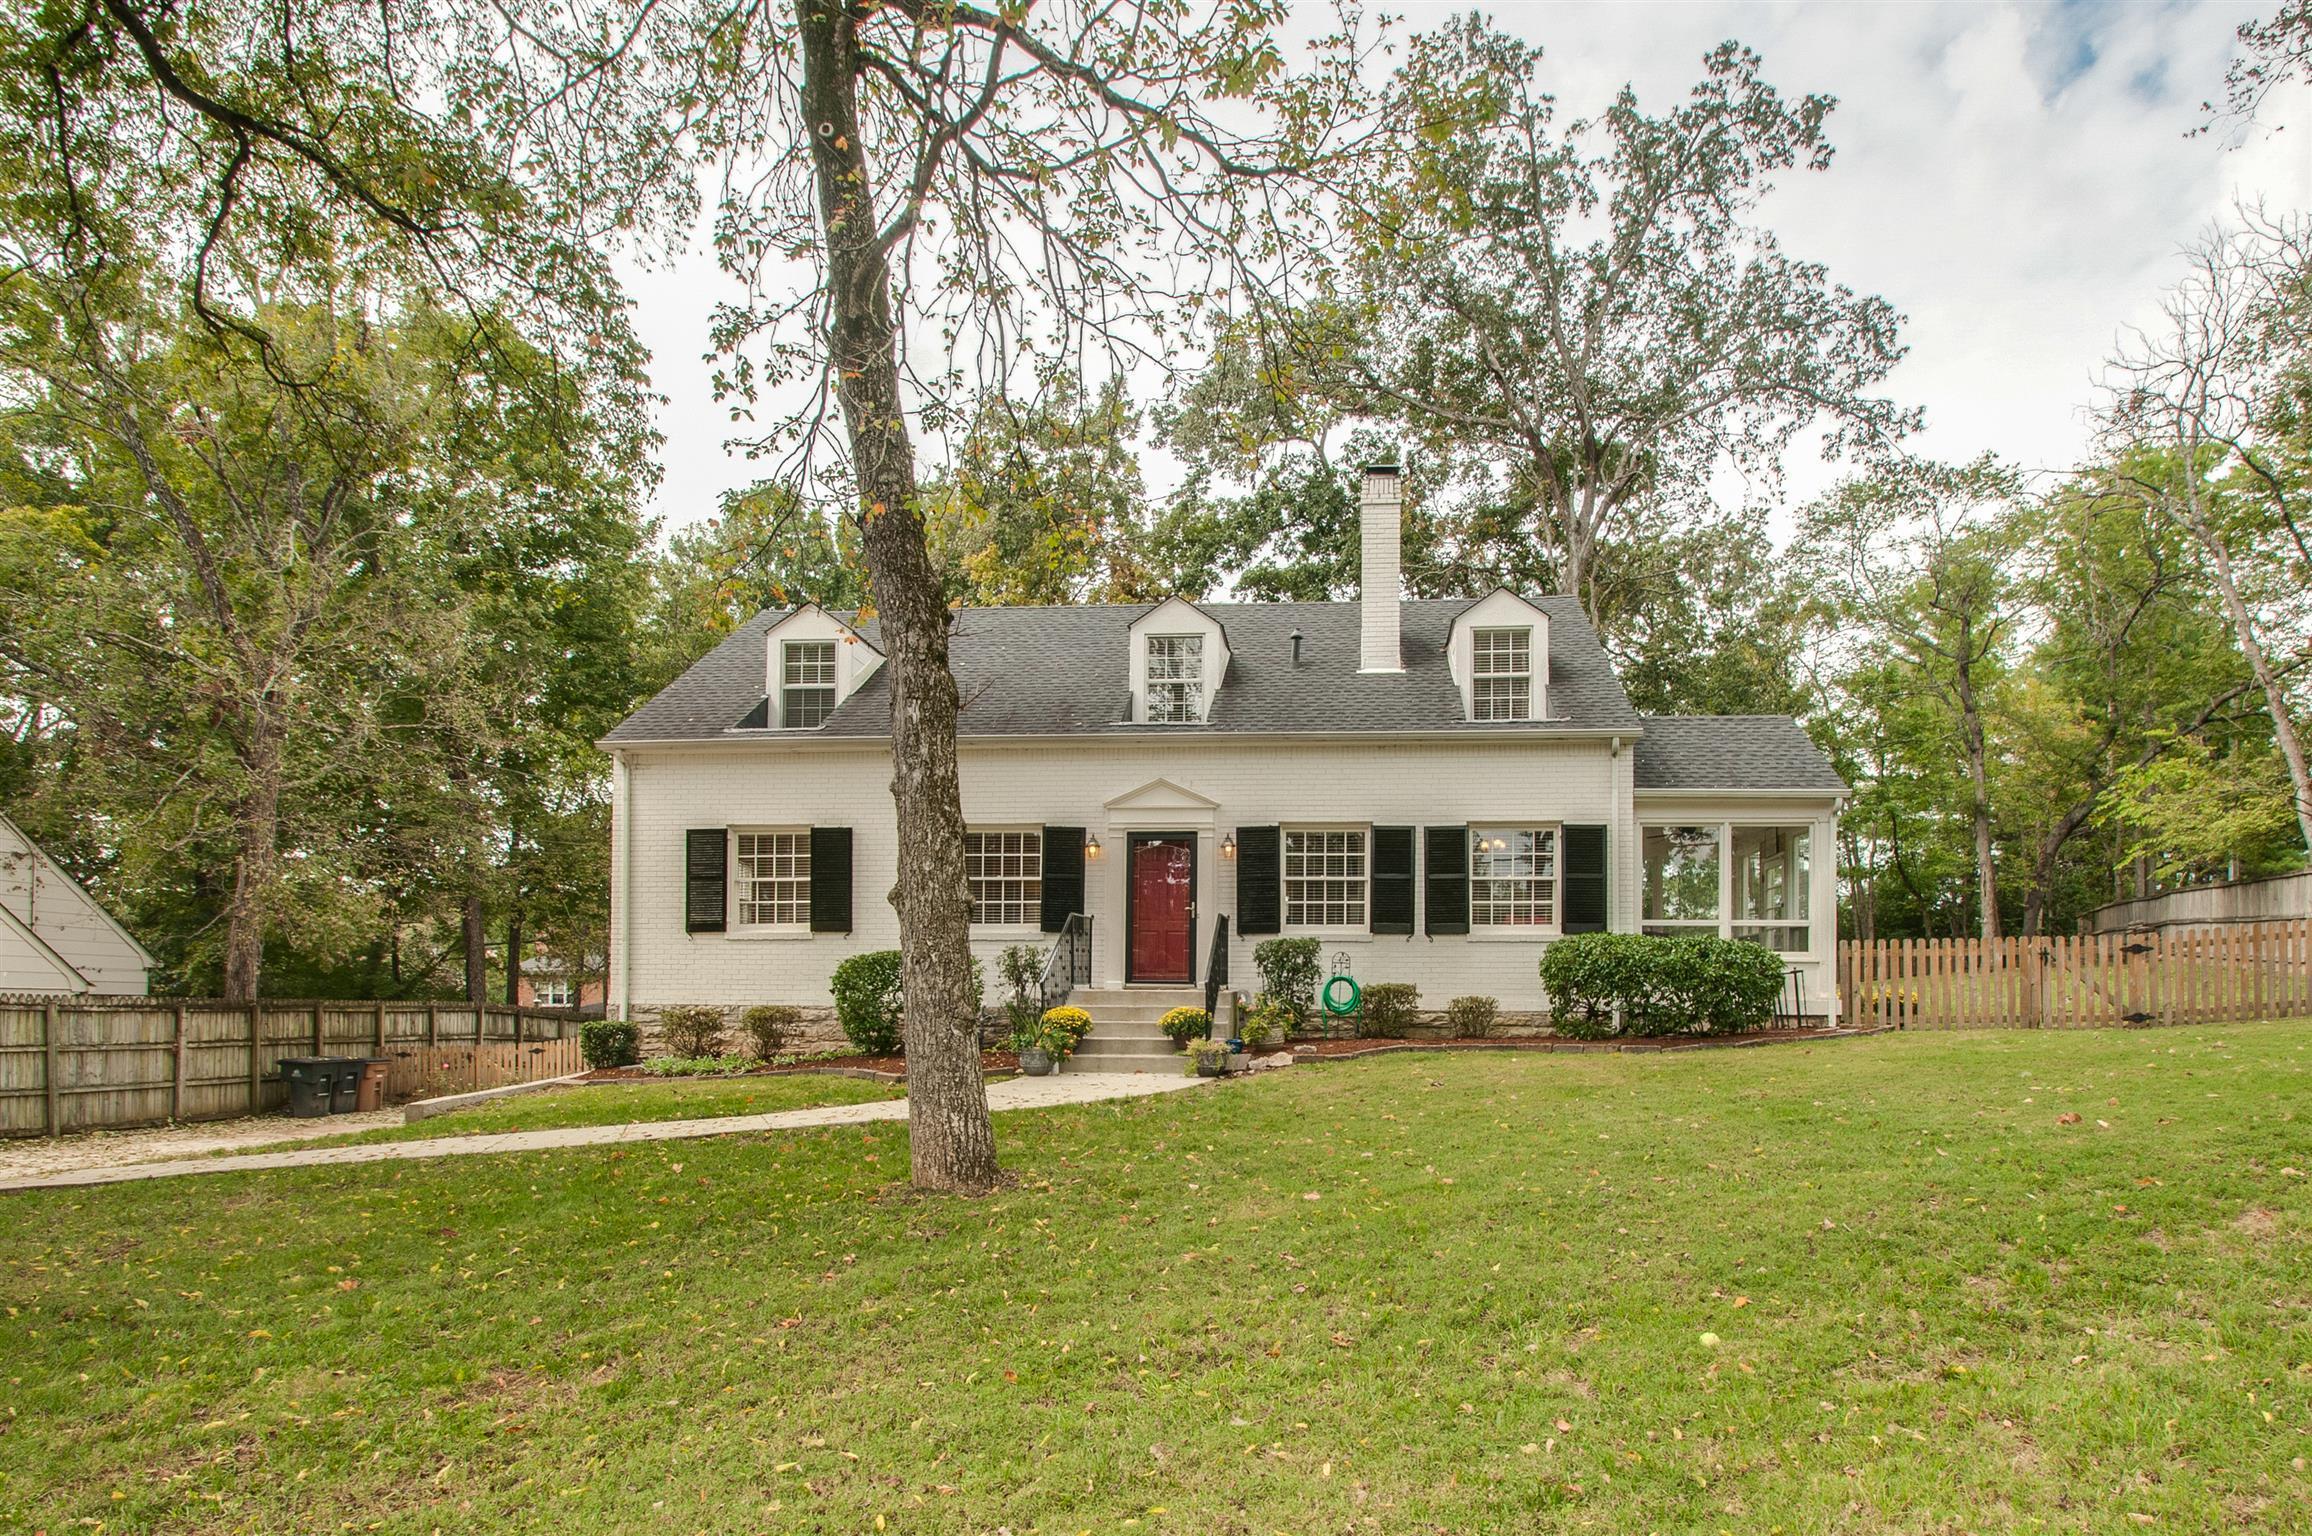 3 bed/2 bath Home in Nashville for $639,000